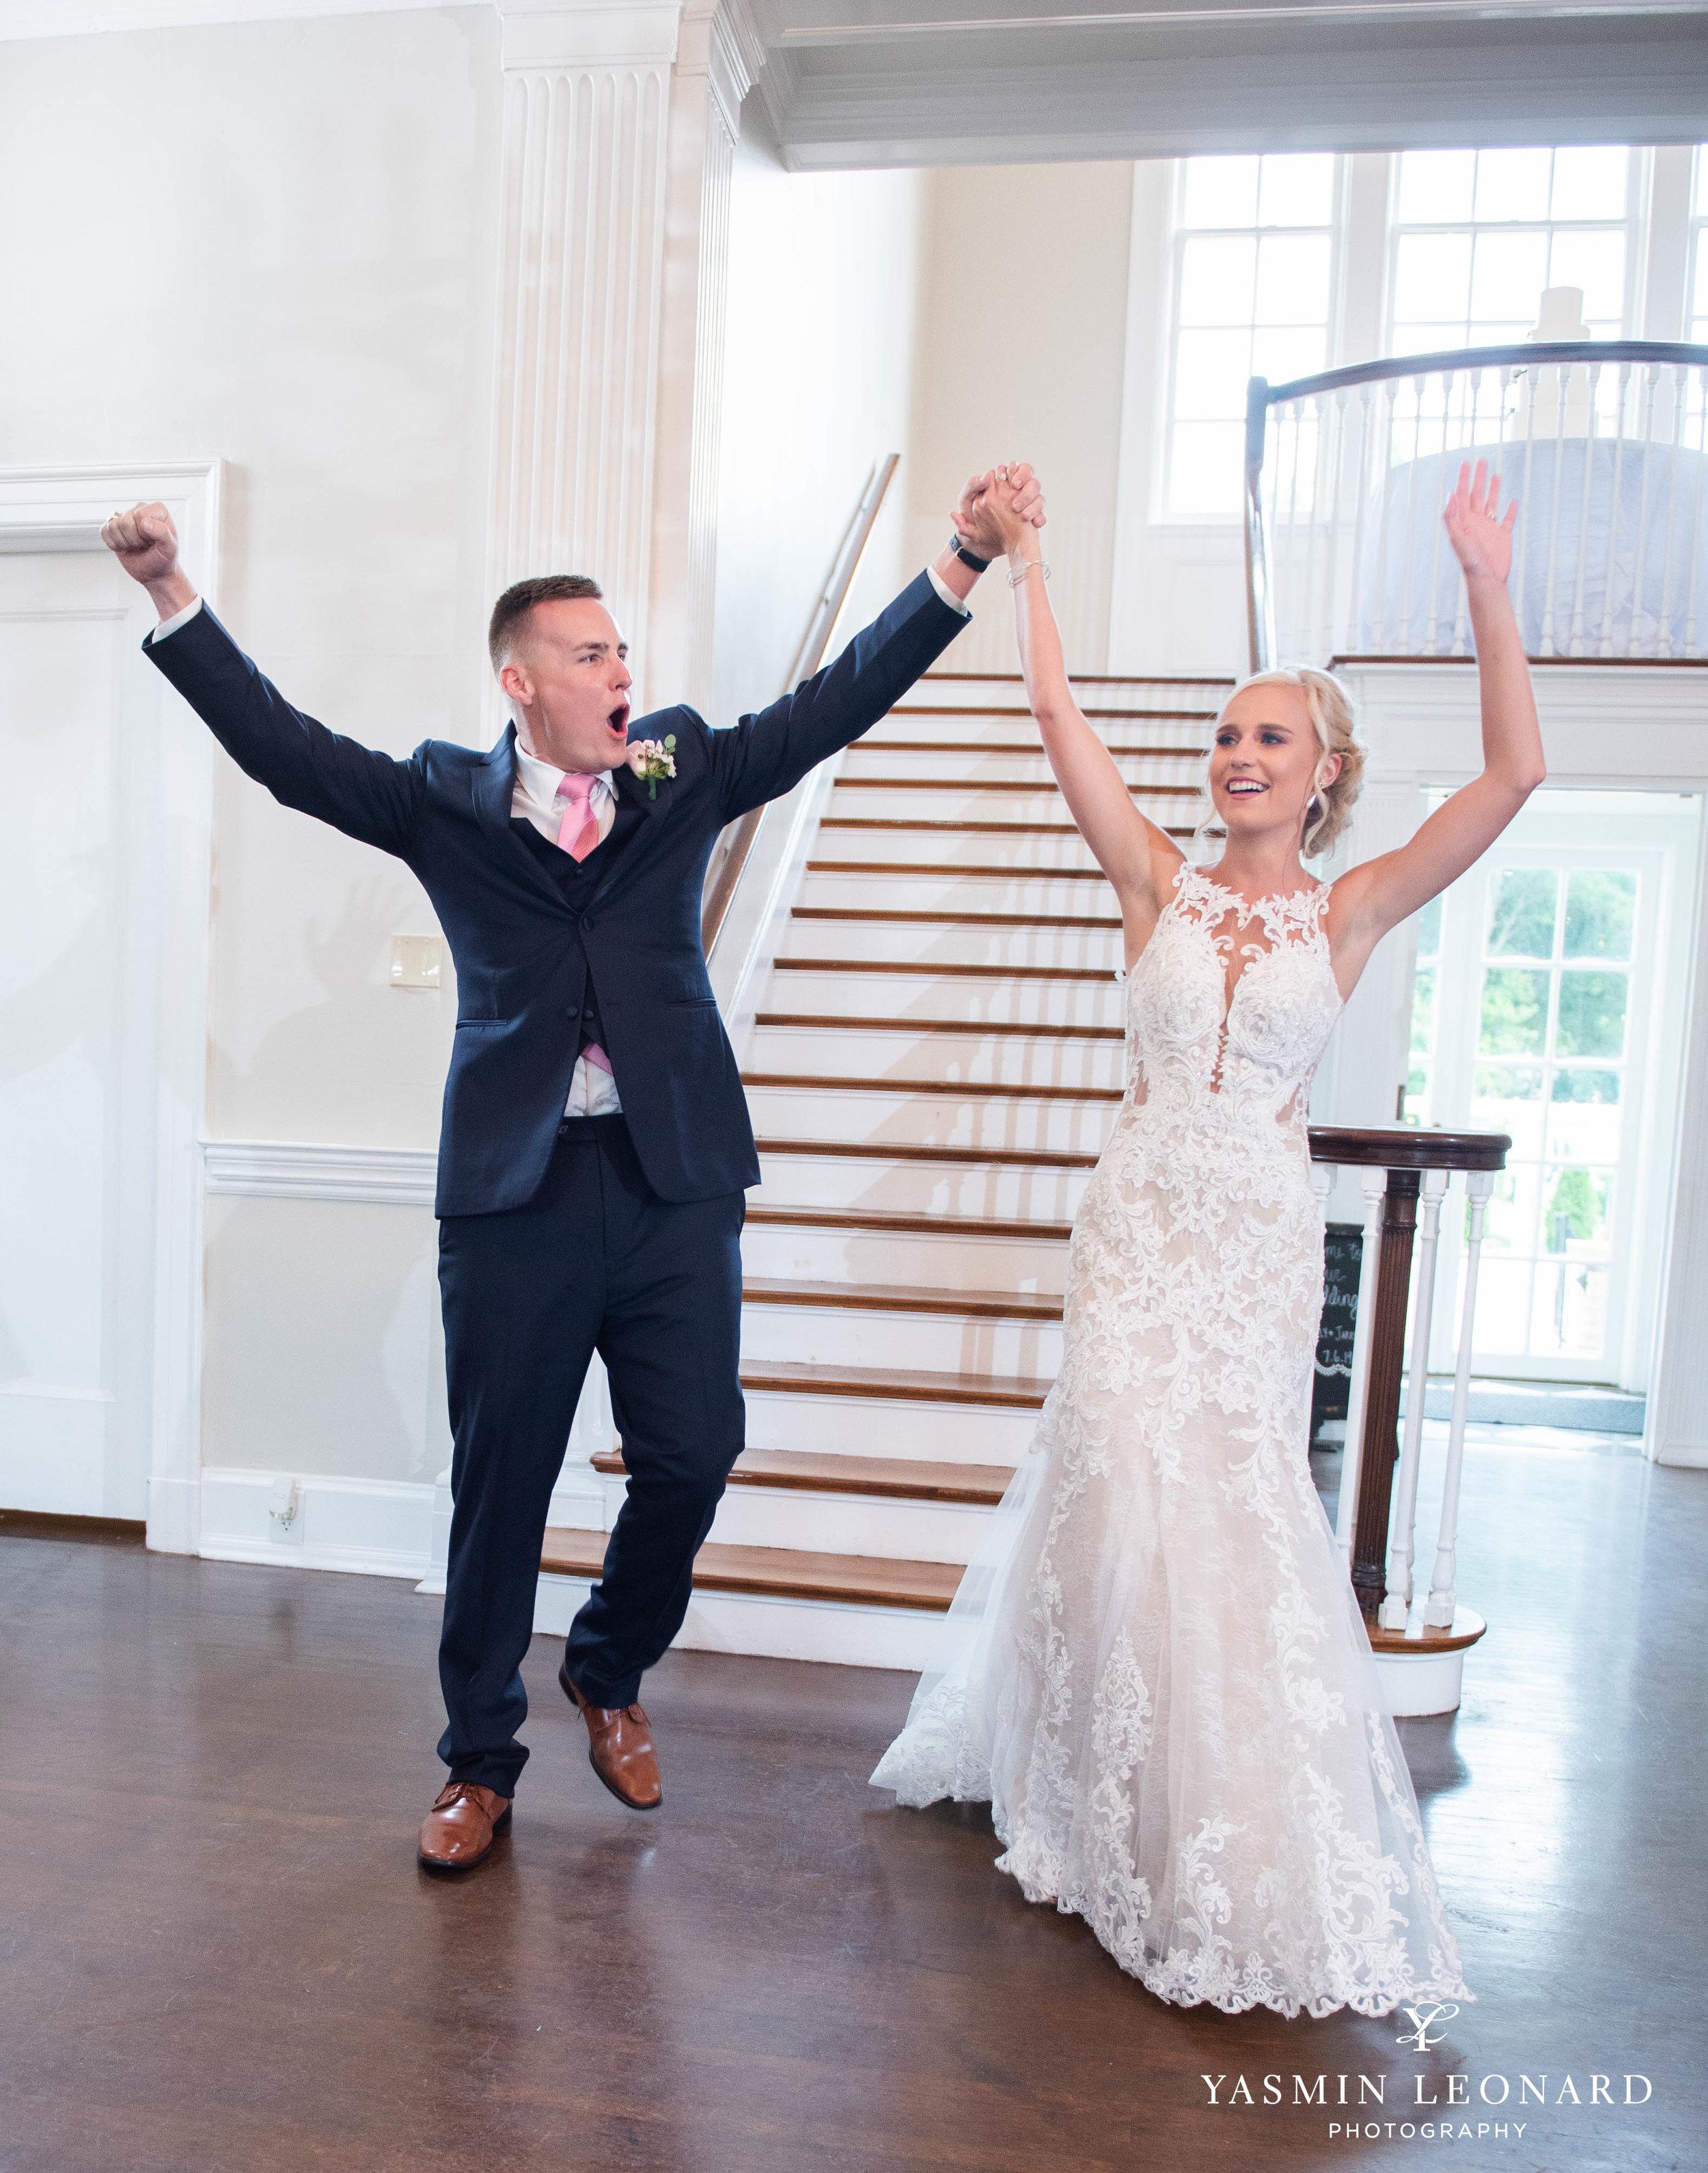 Separk Mansion - NC Weddings - Gastonia Wedding - NC Wedding Venues - Pink and Blue Wedding Ideas - Pink Bridesmaid Dresses - Yasmin Leonard Photography-45.jpg